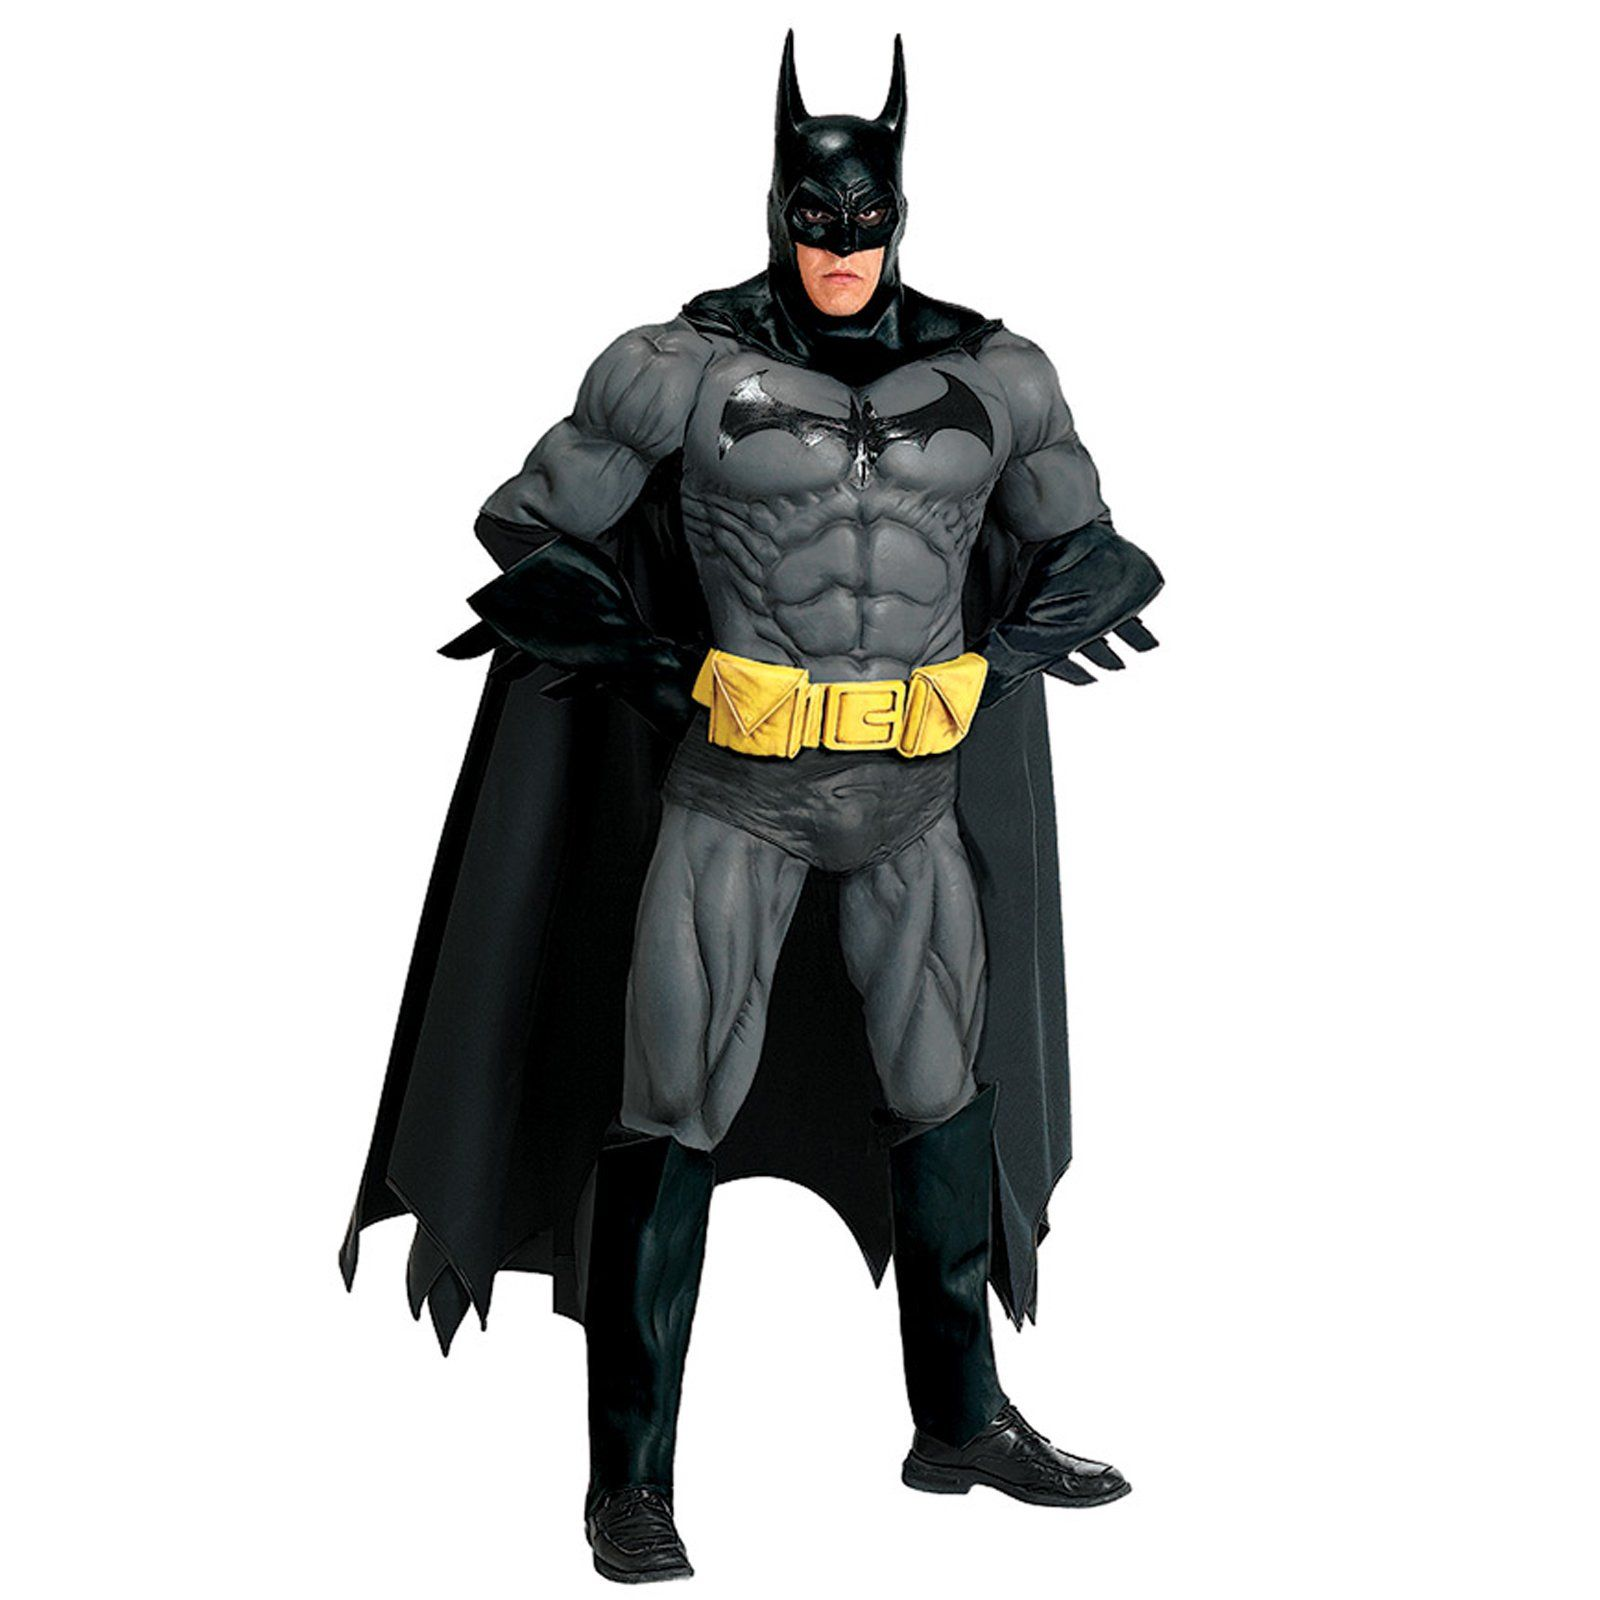 Found my Halloween costume only $800! Iu0027m #Batman!  sc 1 st  Pinterest & Found my Halloween costume only $800! Iu0027m #Batman!   Life and ...